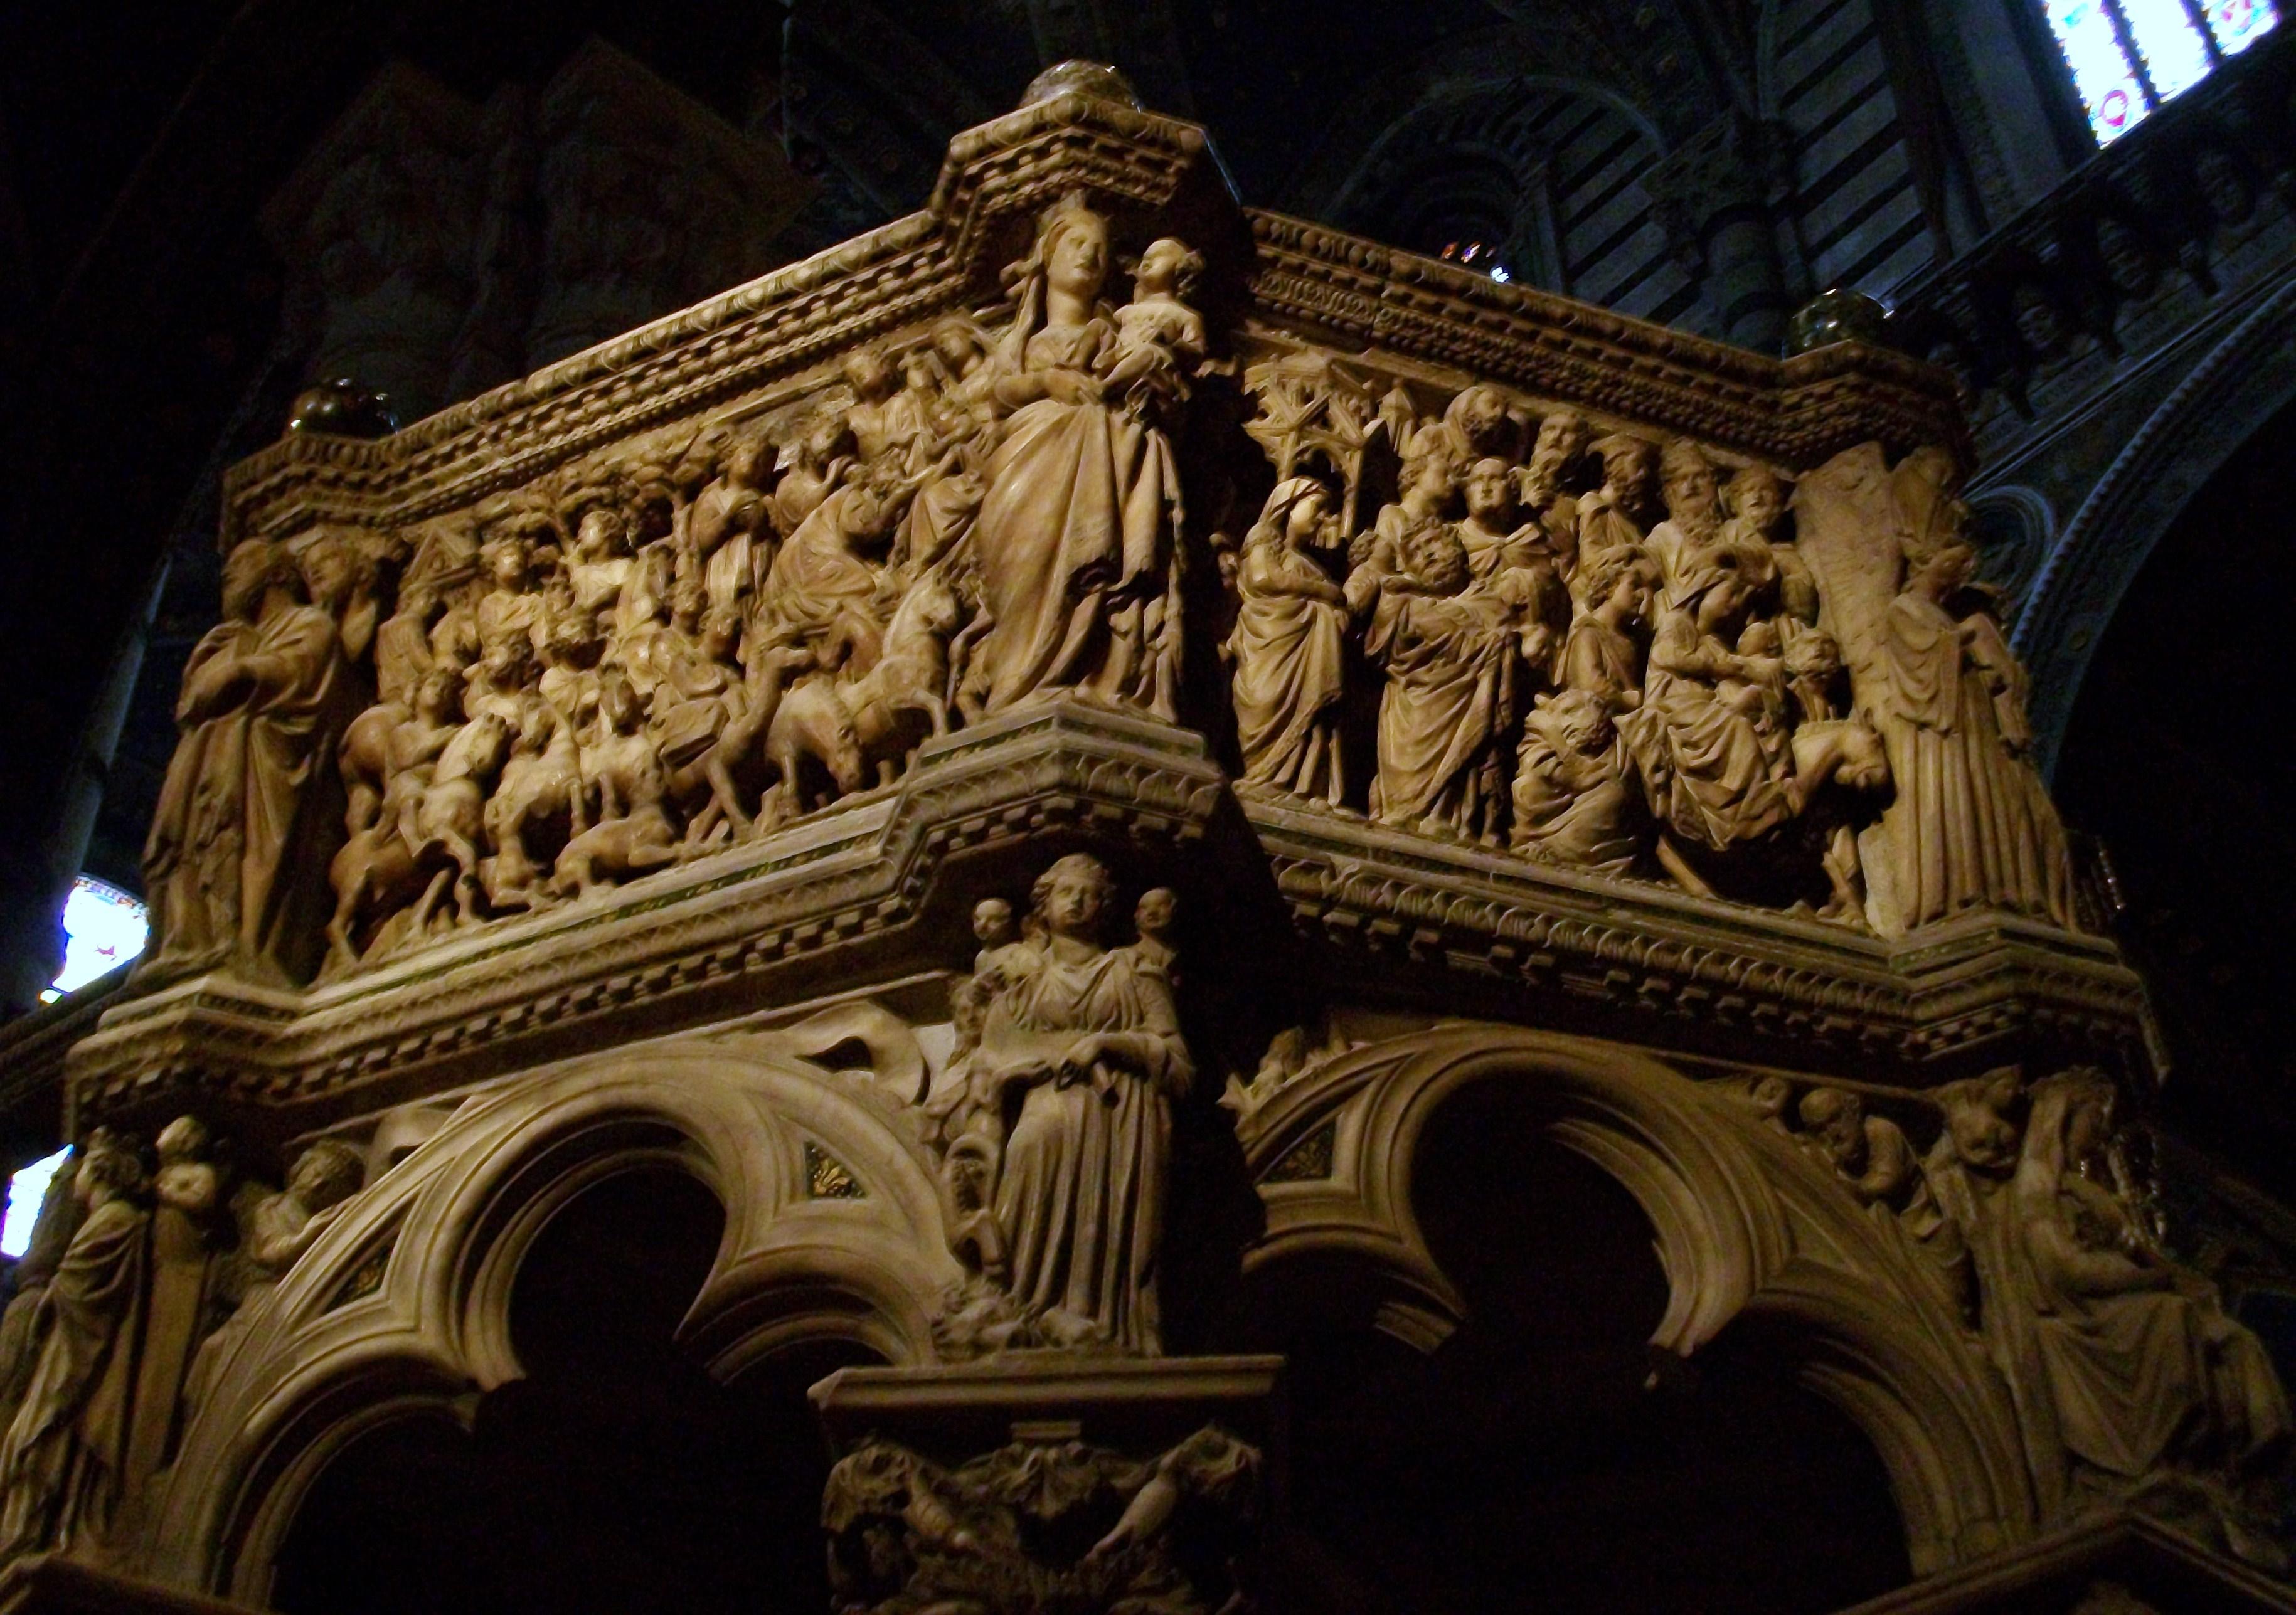 Nicola Pisano Nicola_Pisano,_p%C3%BAlpit_de_la_catedral_de_Siena